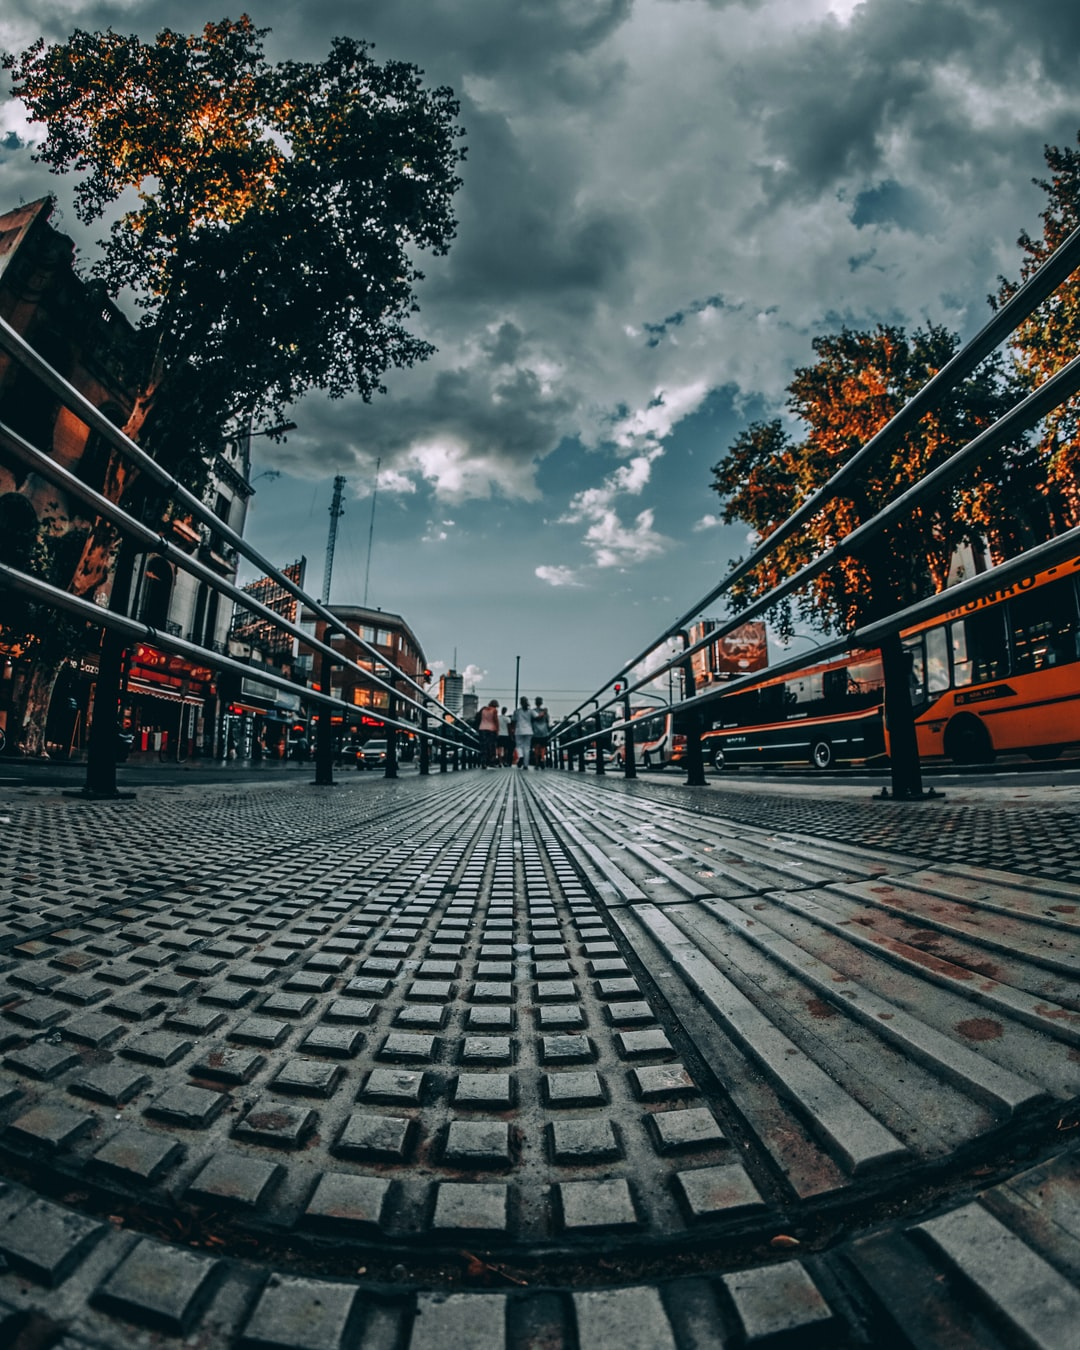 Street mode #2 in Argentina, followme in my Instagram @dav1dbasile for more!!!